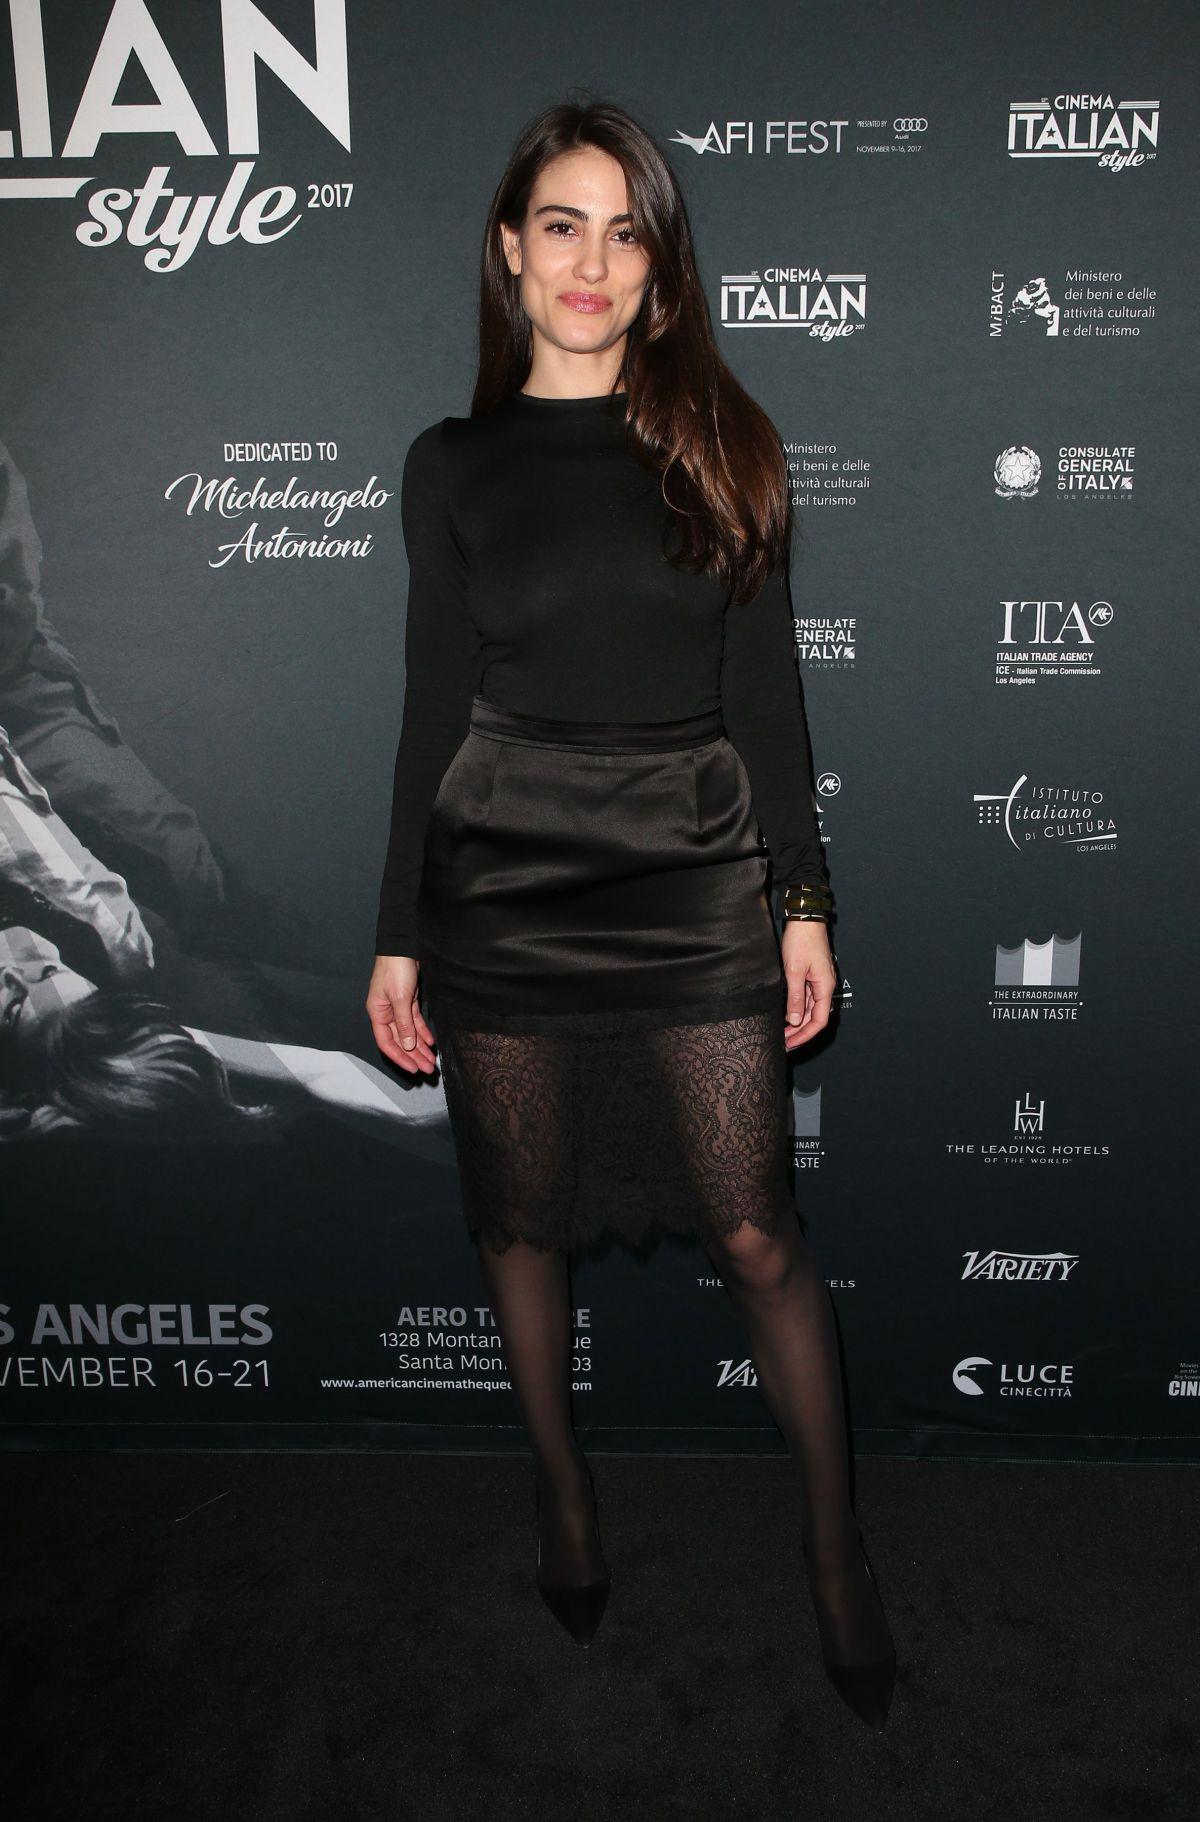 Luisa moraes a ciambra screening cinema italian style in los angeles naked (37 photo), Feet Celebrity photo